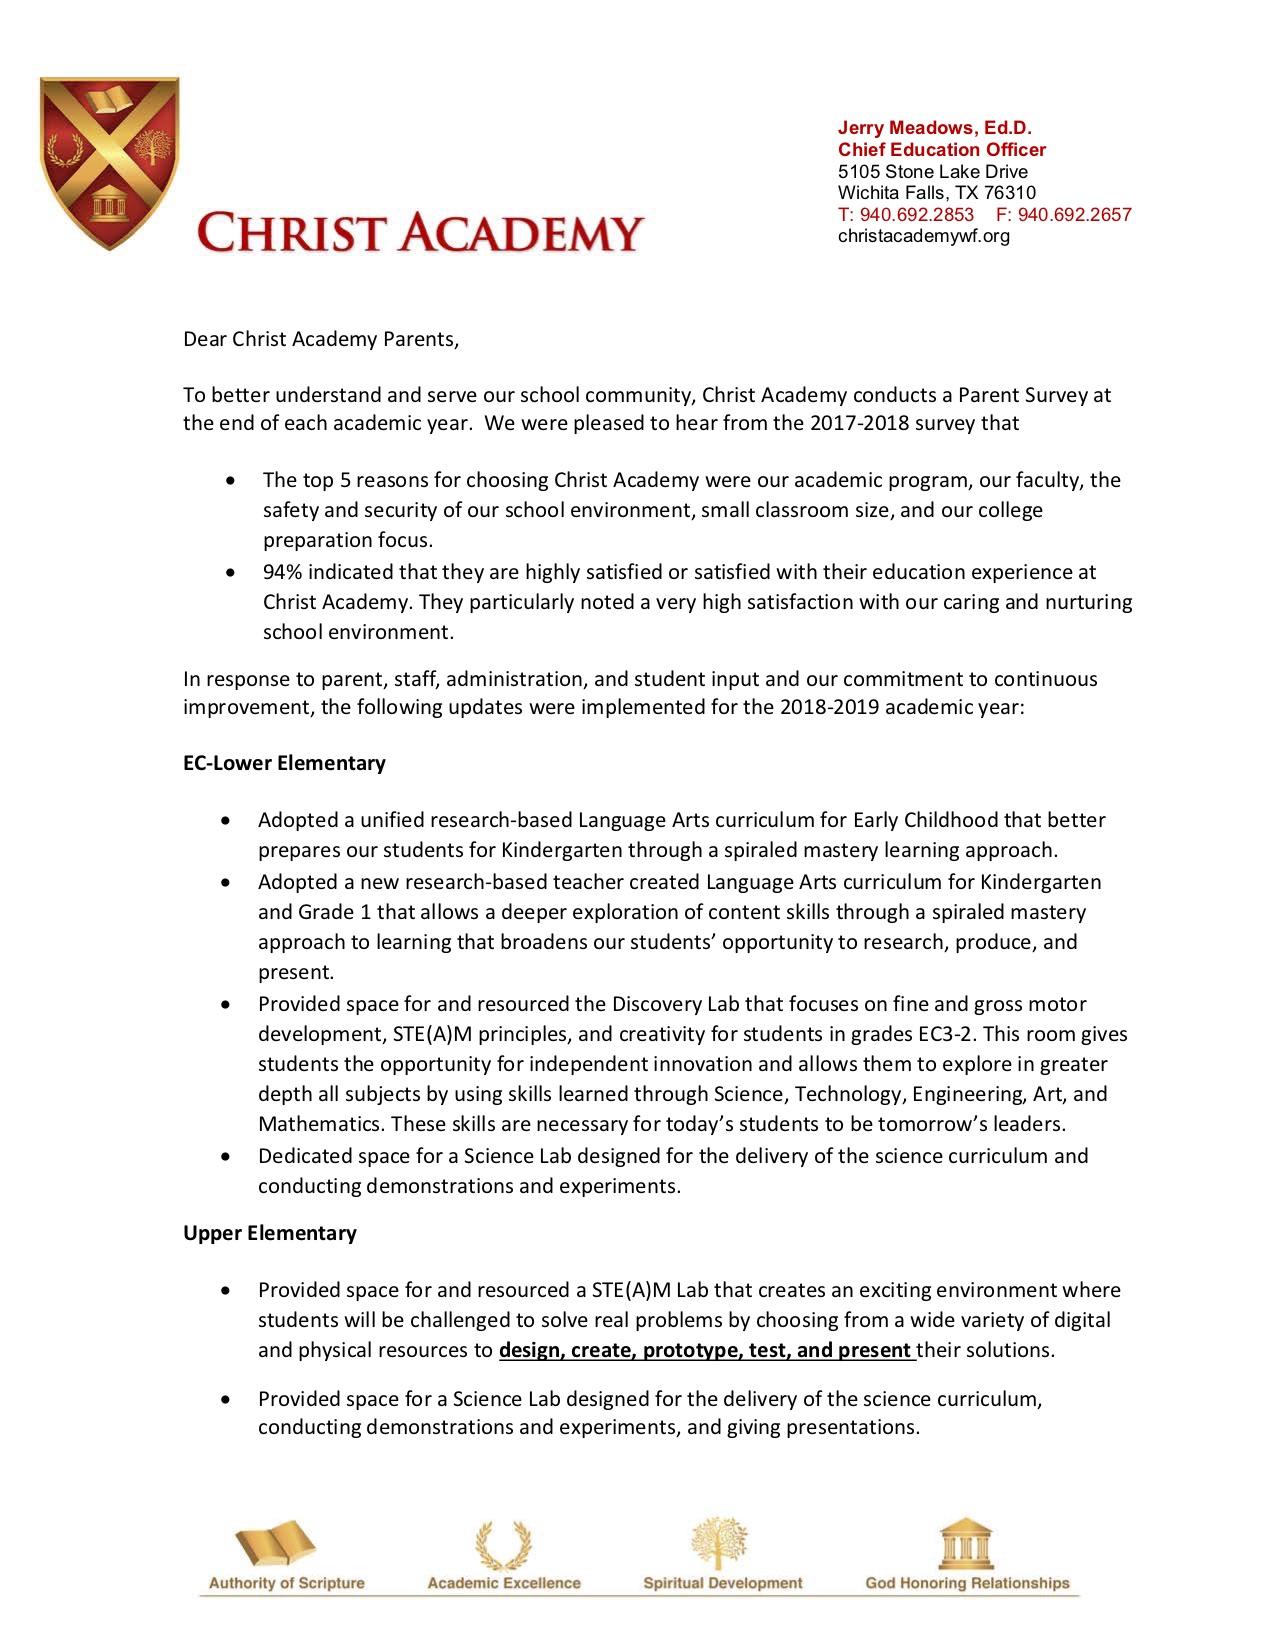 Dr. Meadows 2018-2019 Updates Letter.jpg